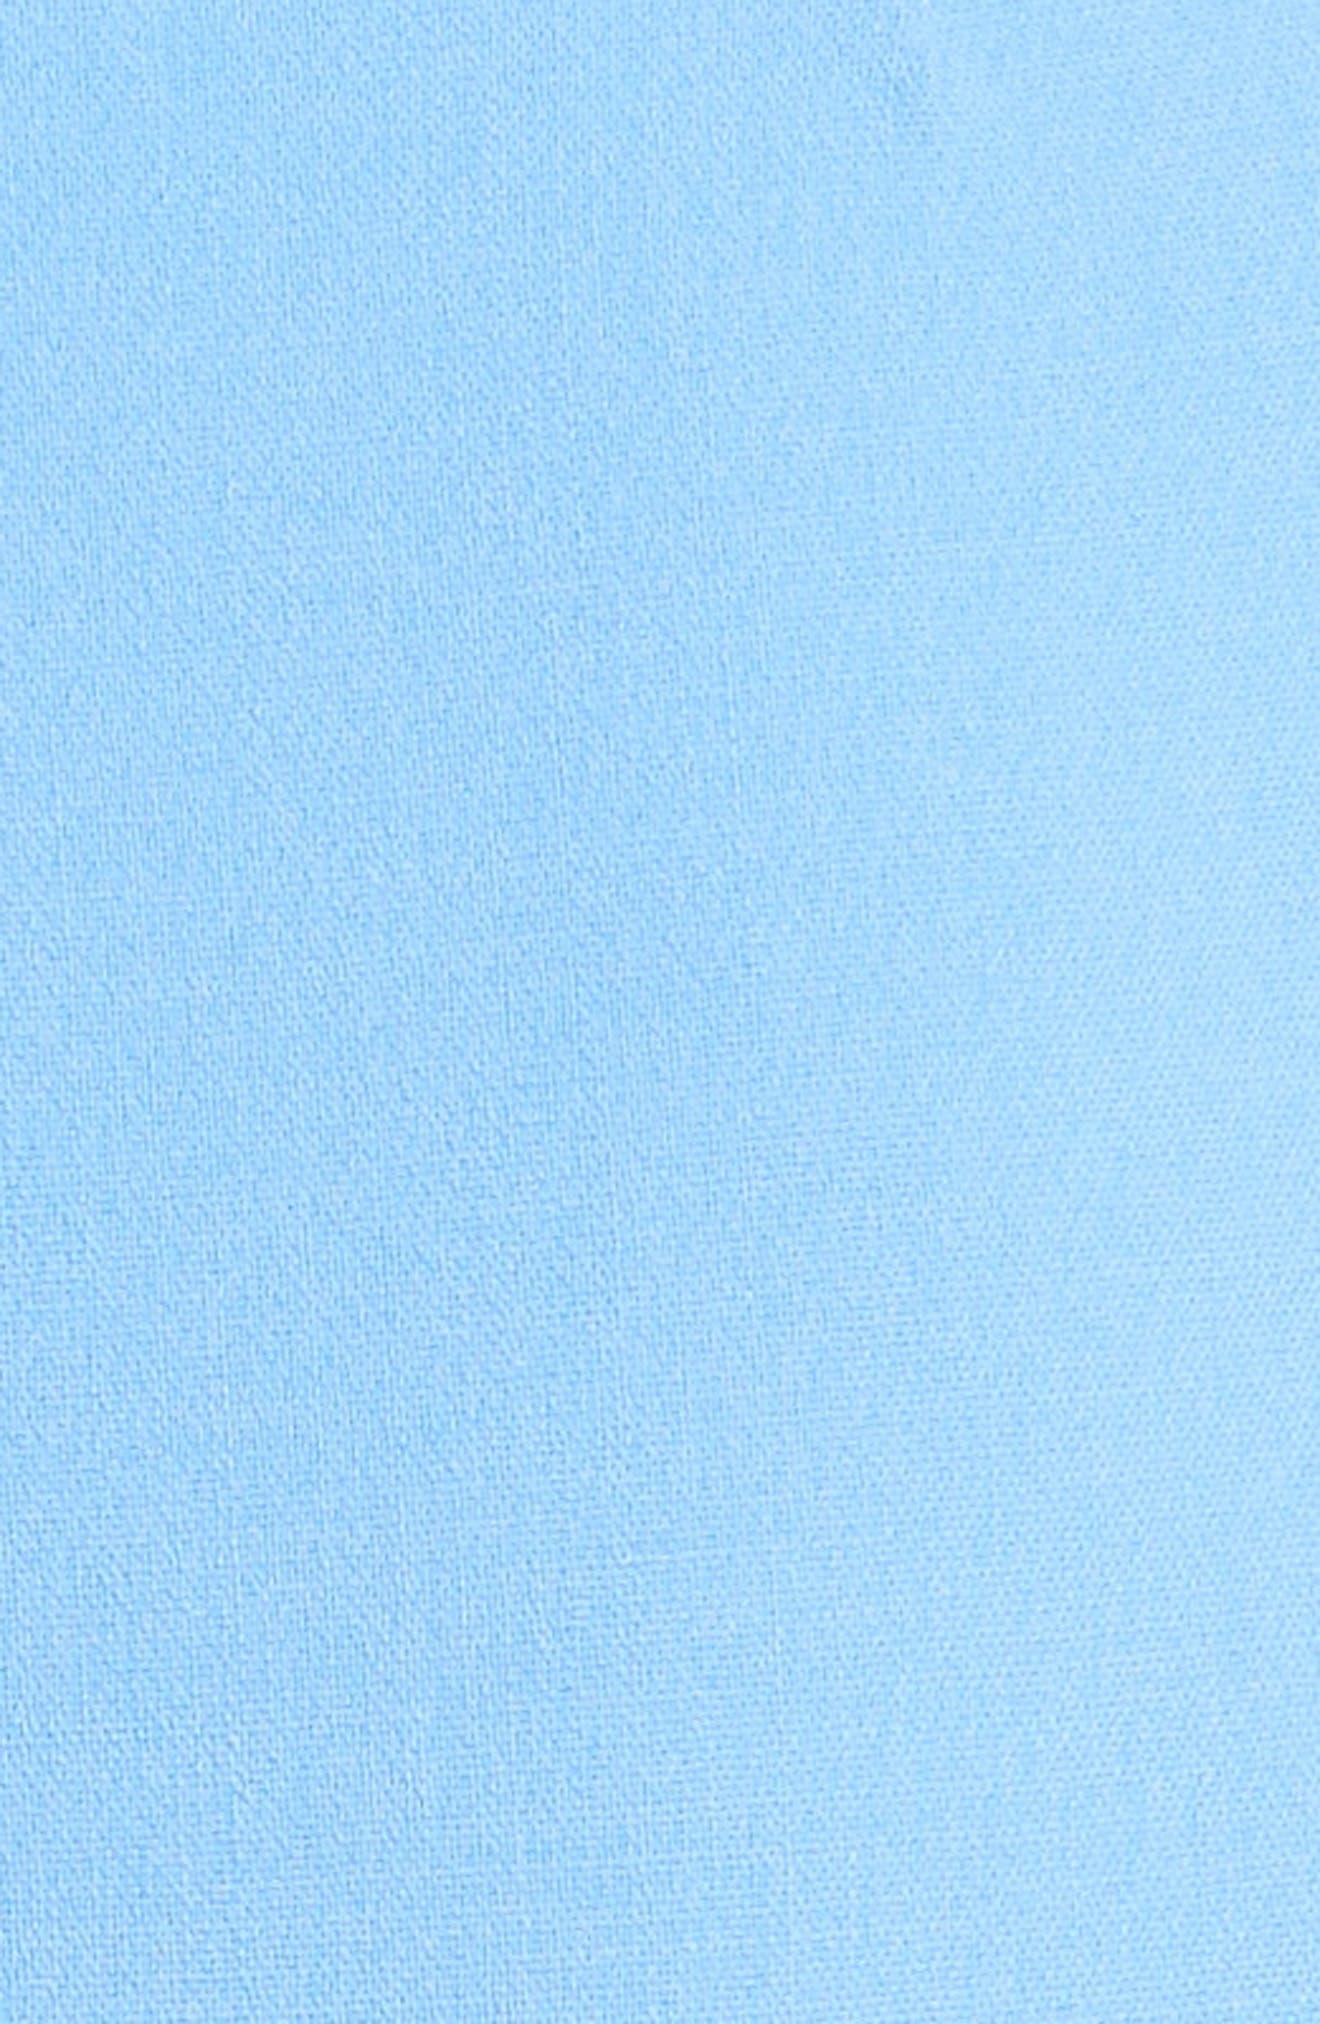 Alternate Image 3  - Michael Kors Stretch Wool Crepe Sheath Dress